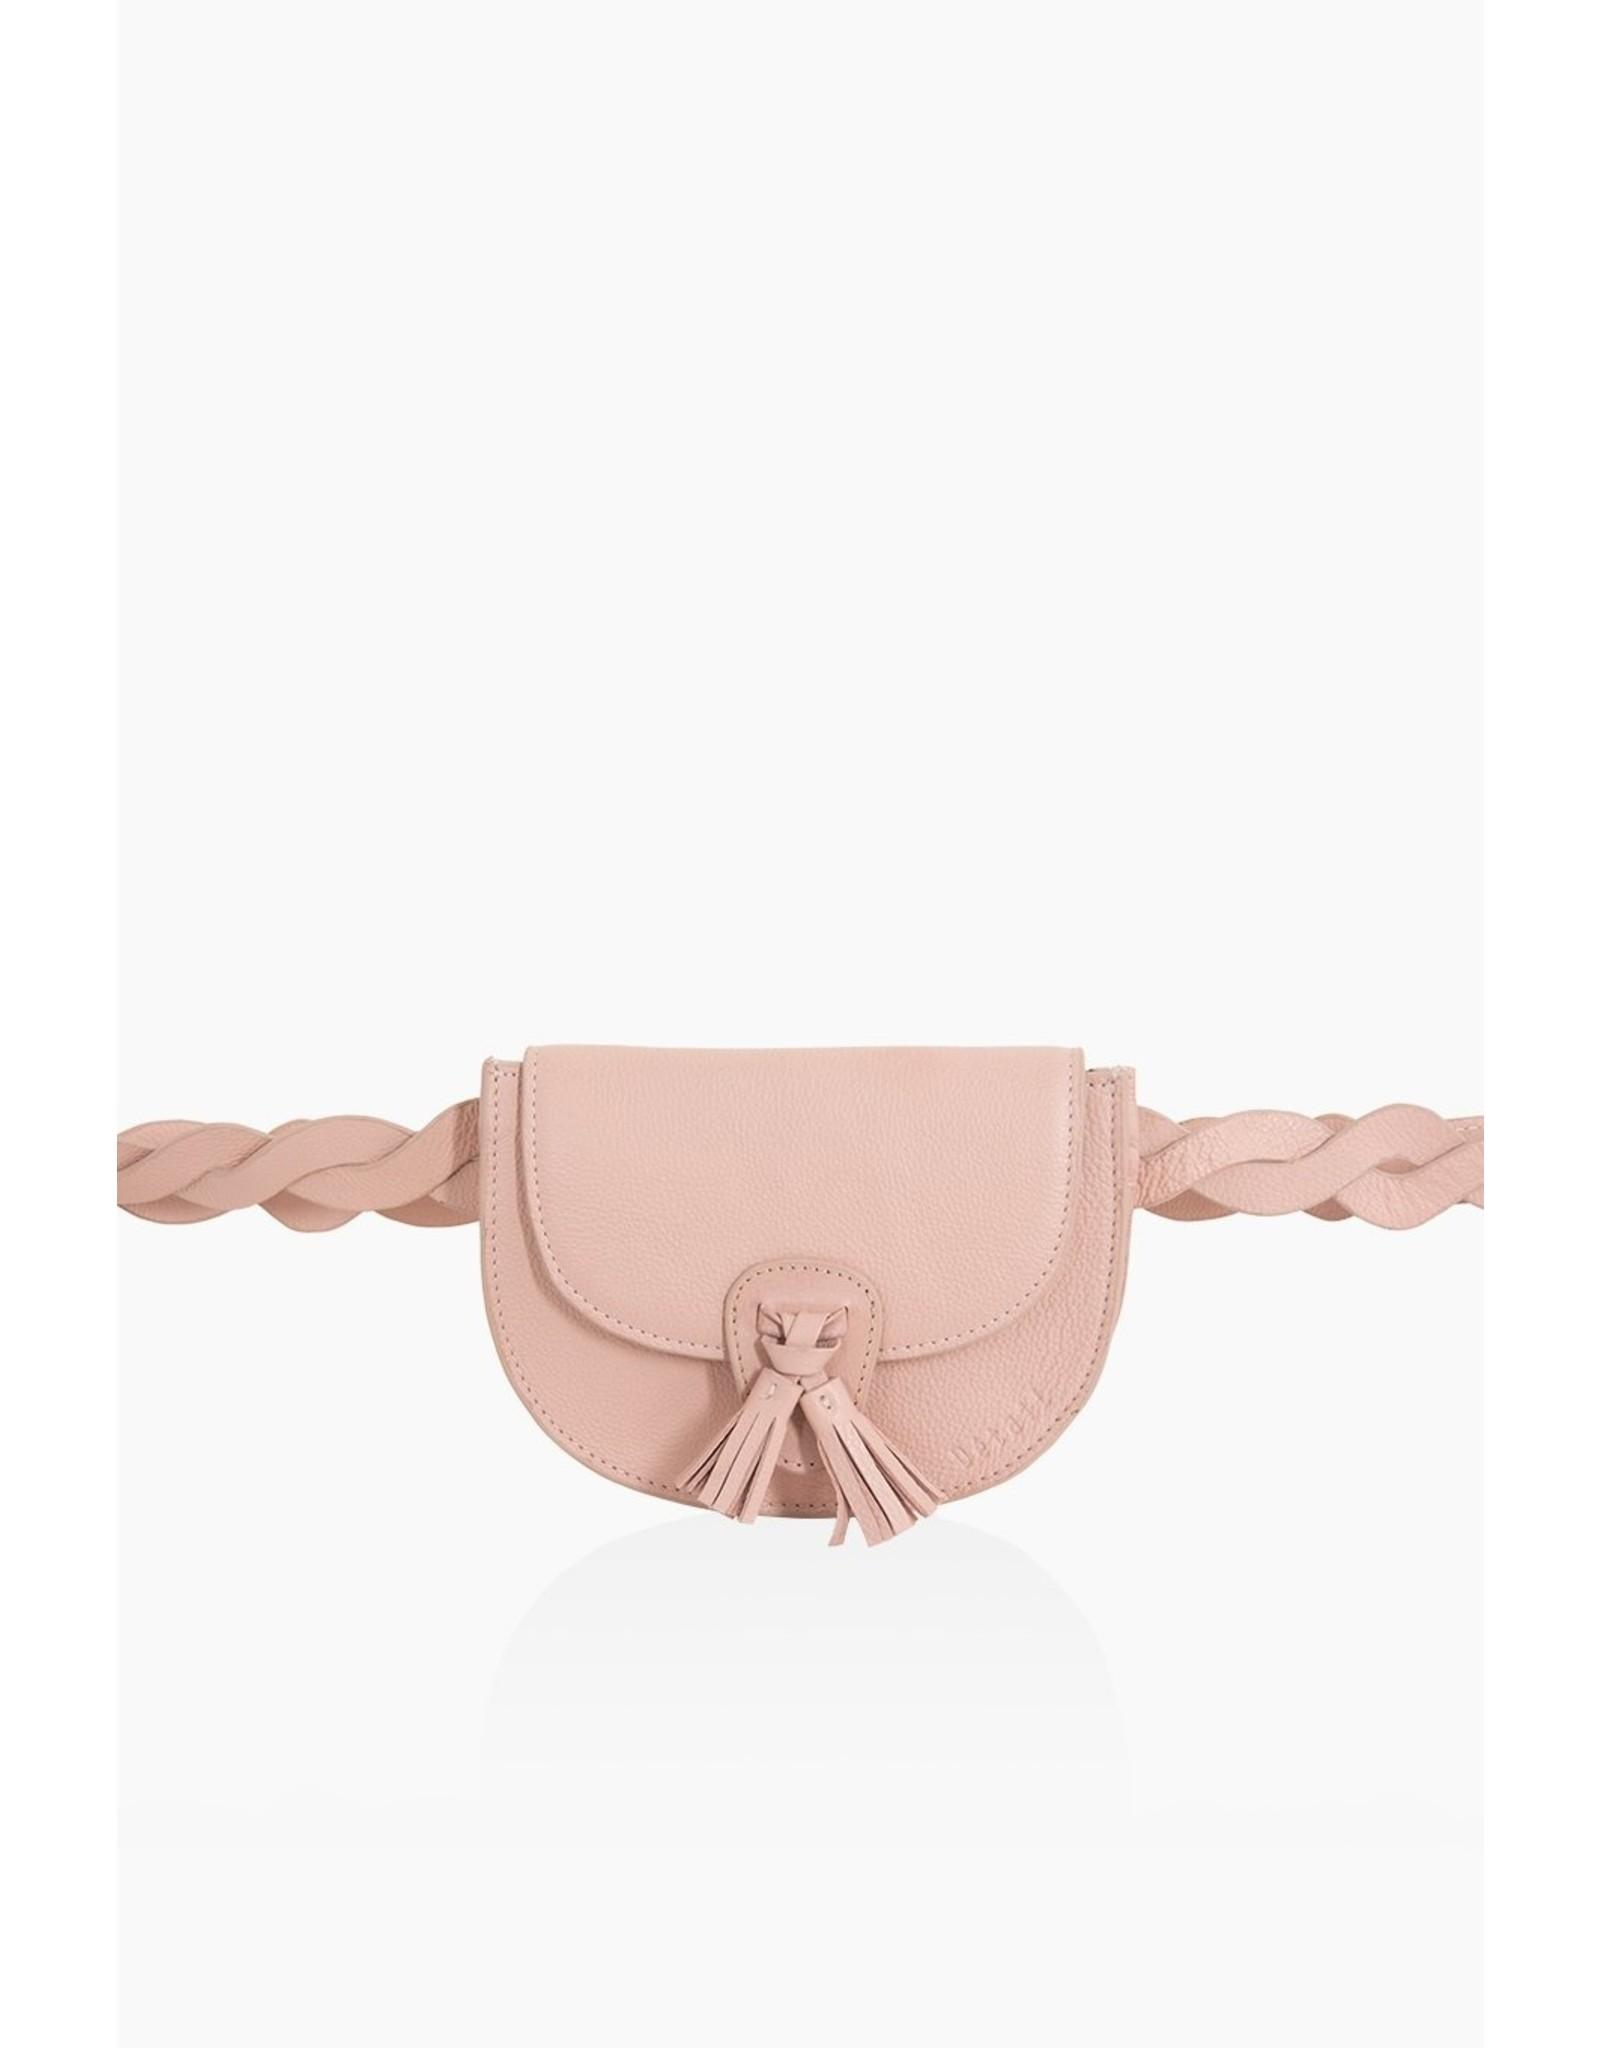 Crossbody soft pink